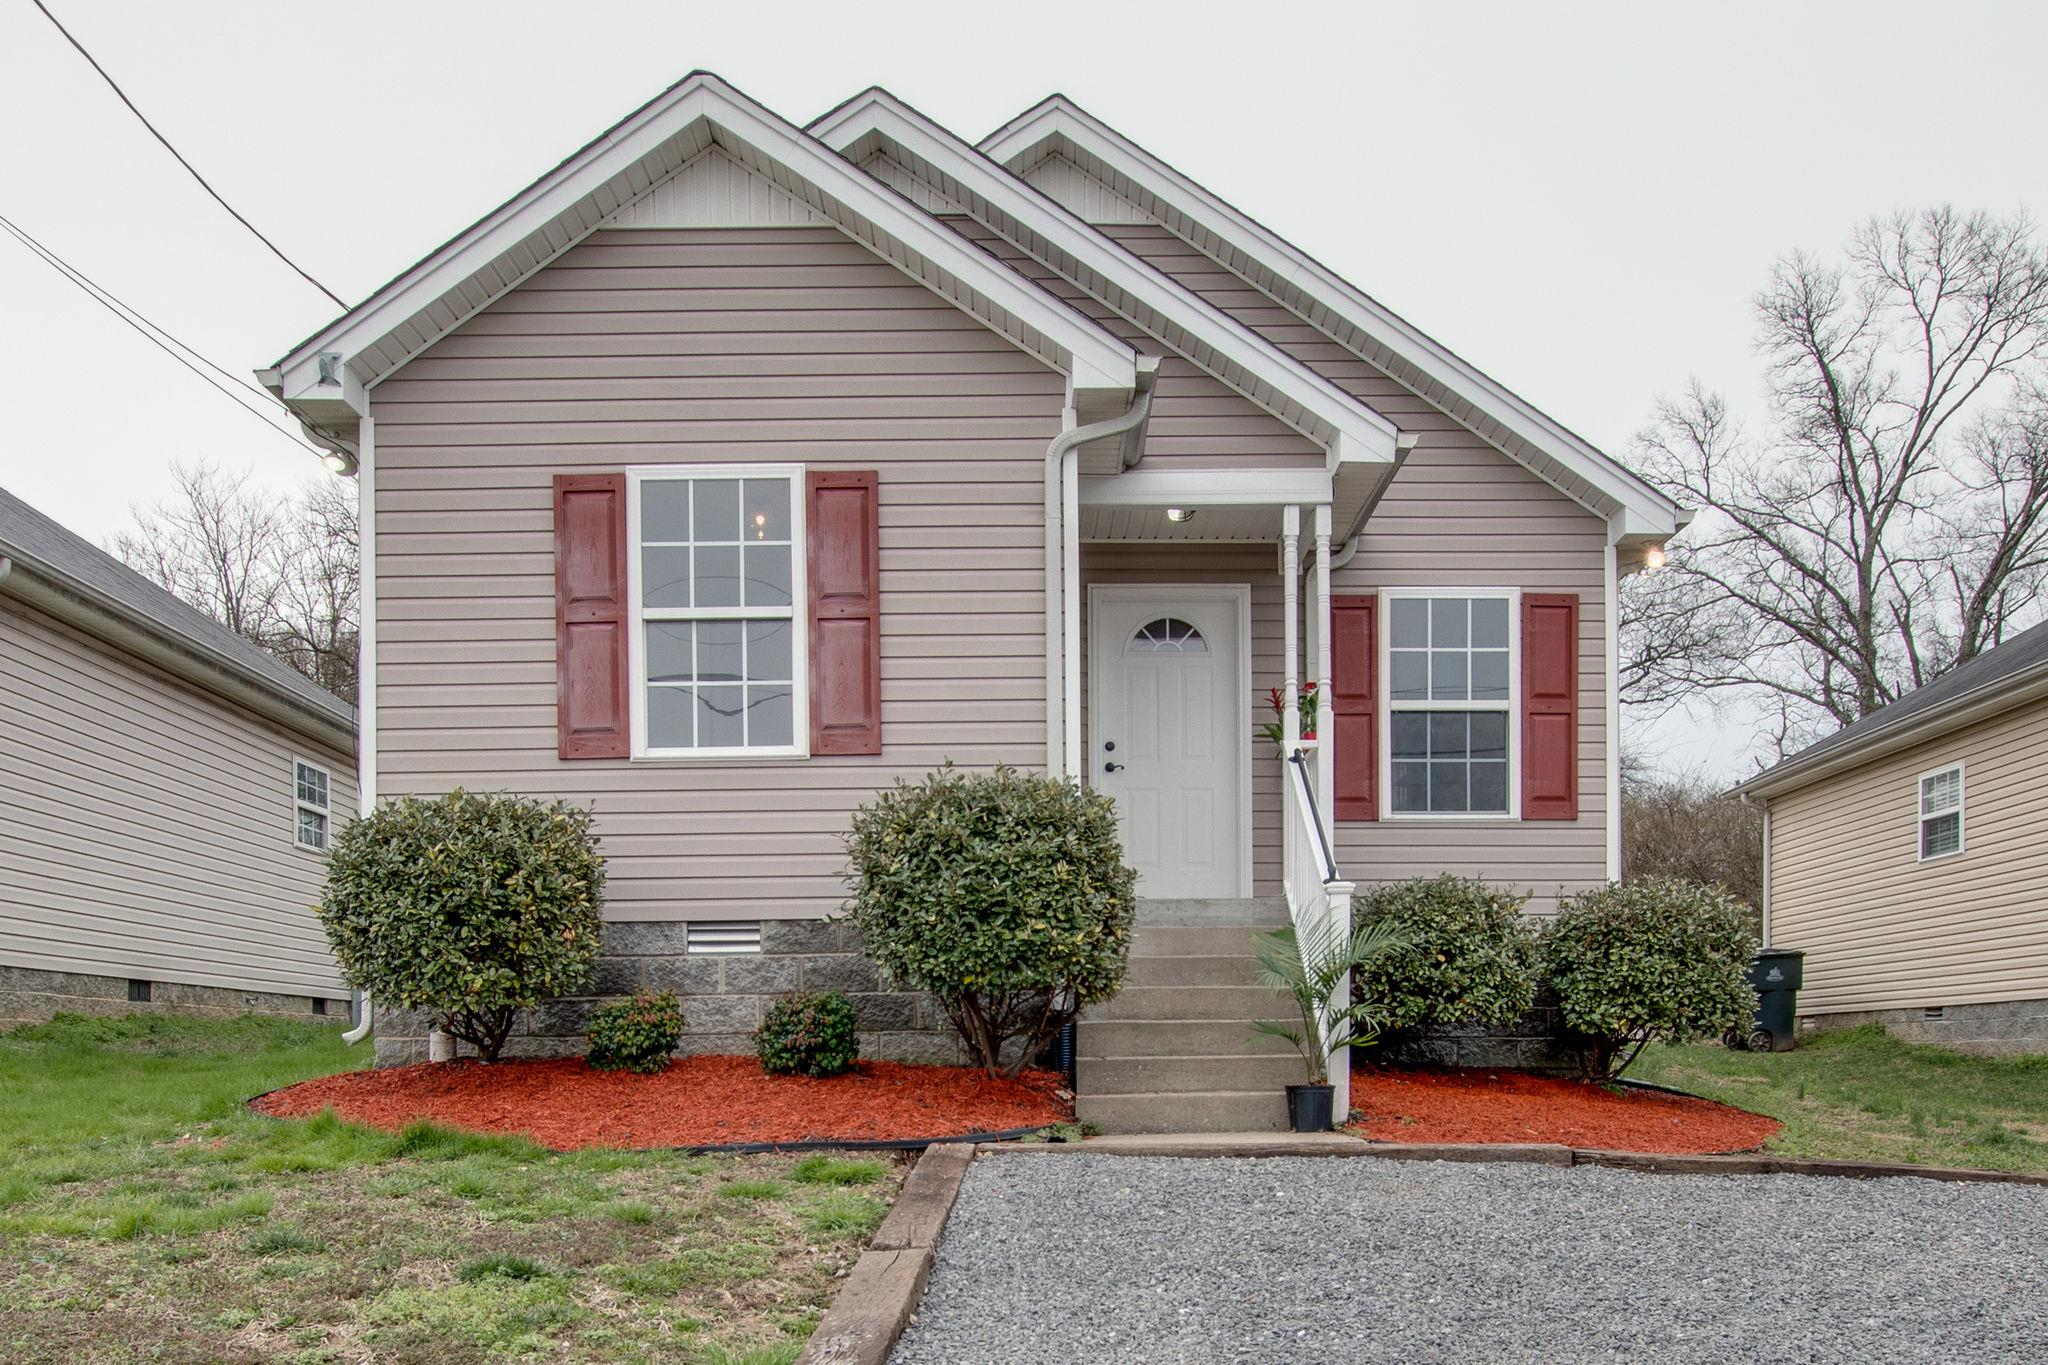 1513 Luton St, Nashville, TN 37207 - Nashville, TN real estate listing